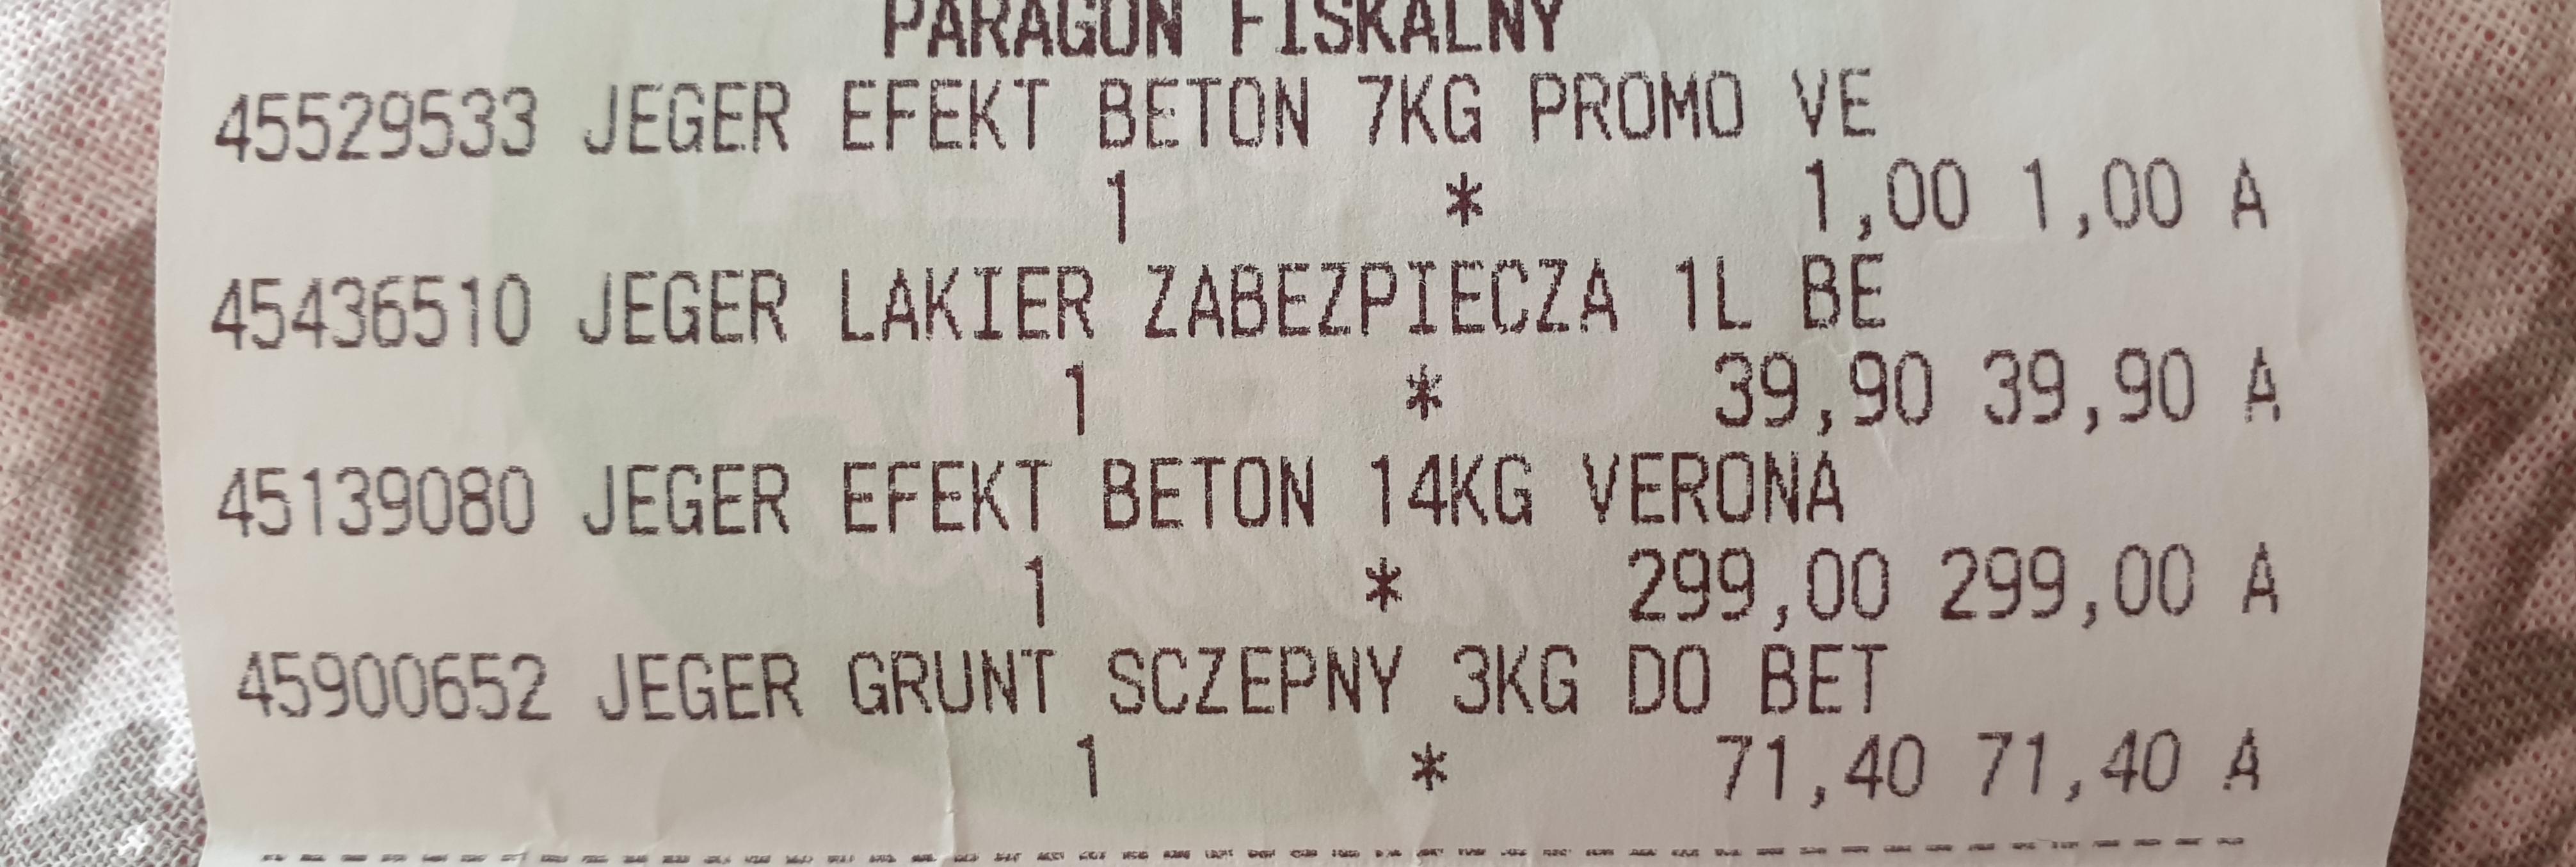 Jeger efekt betonu 21 kg Leroy Merlin Port Łódź